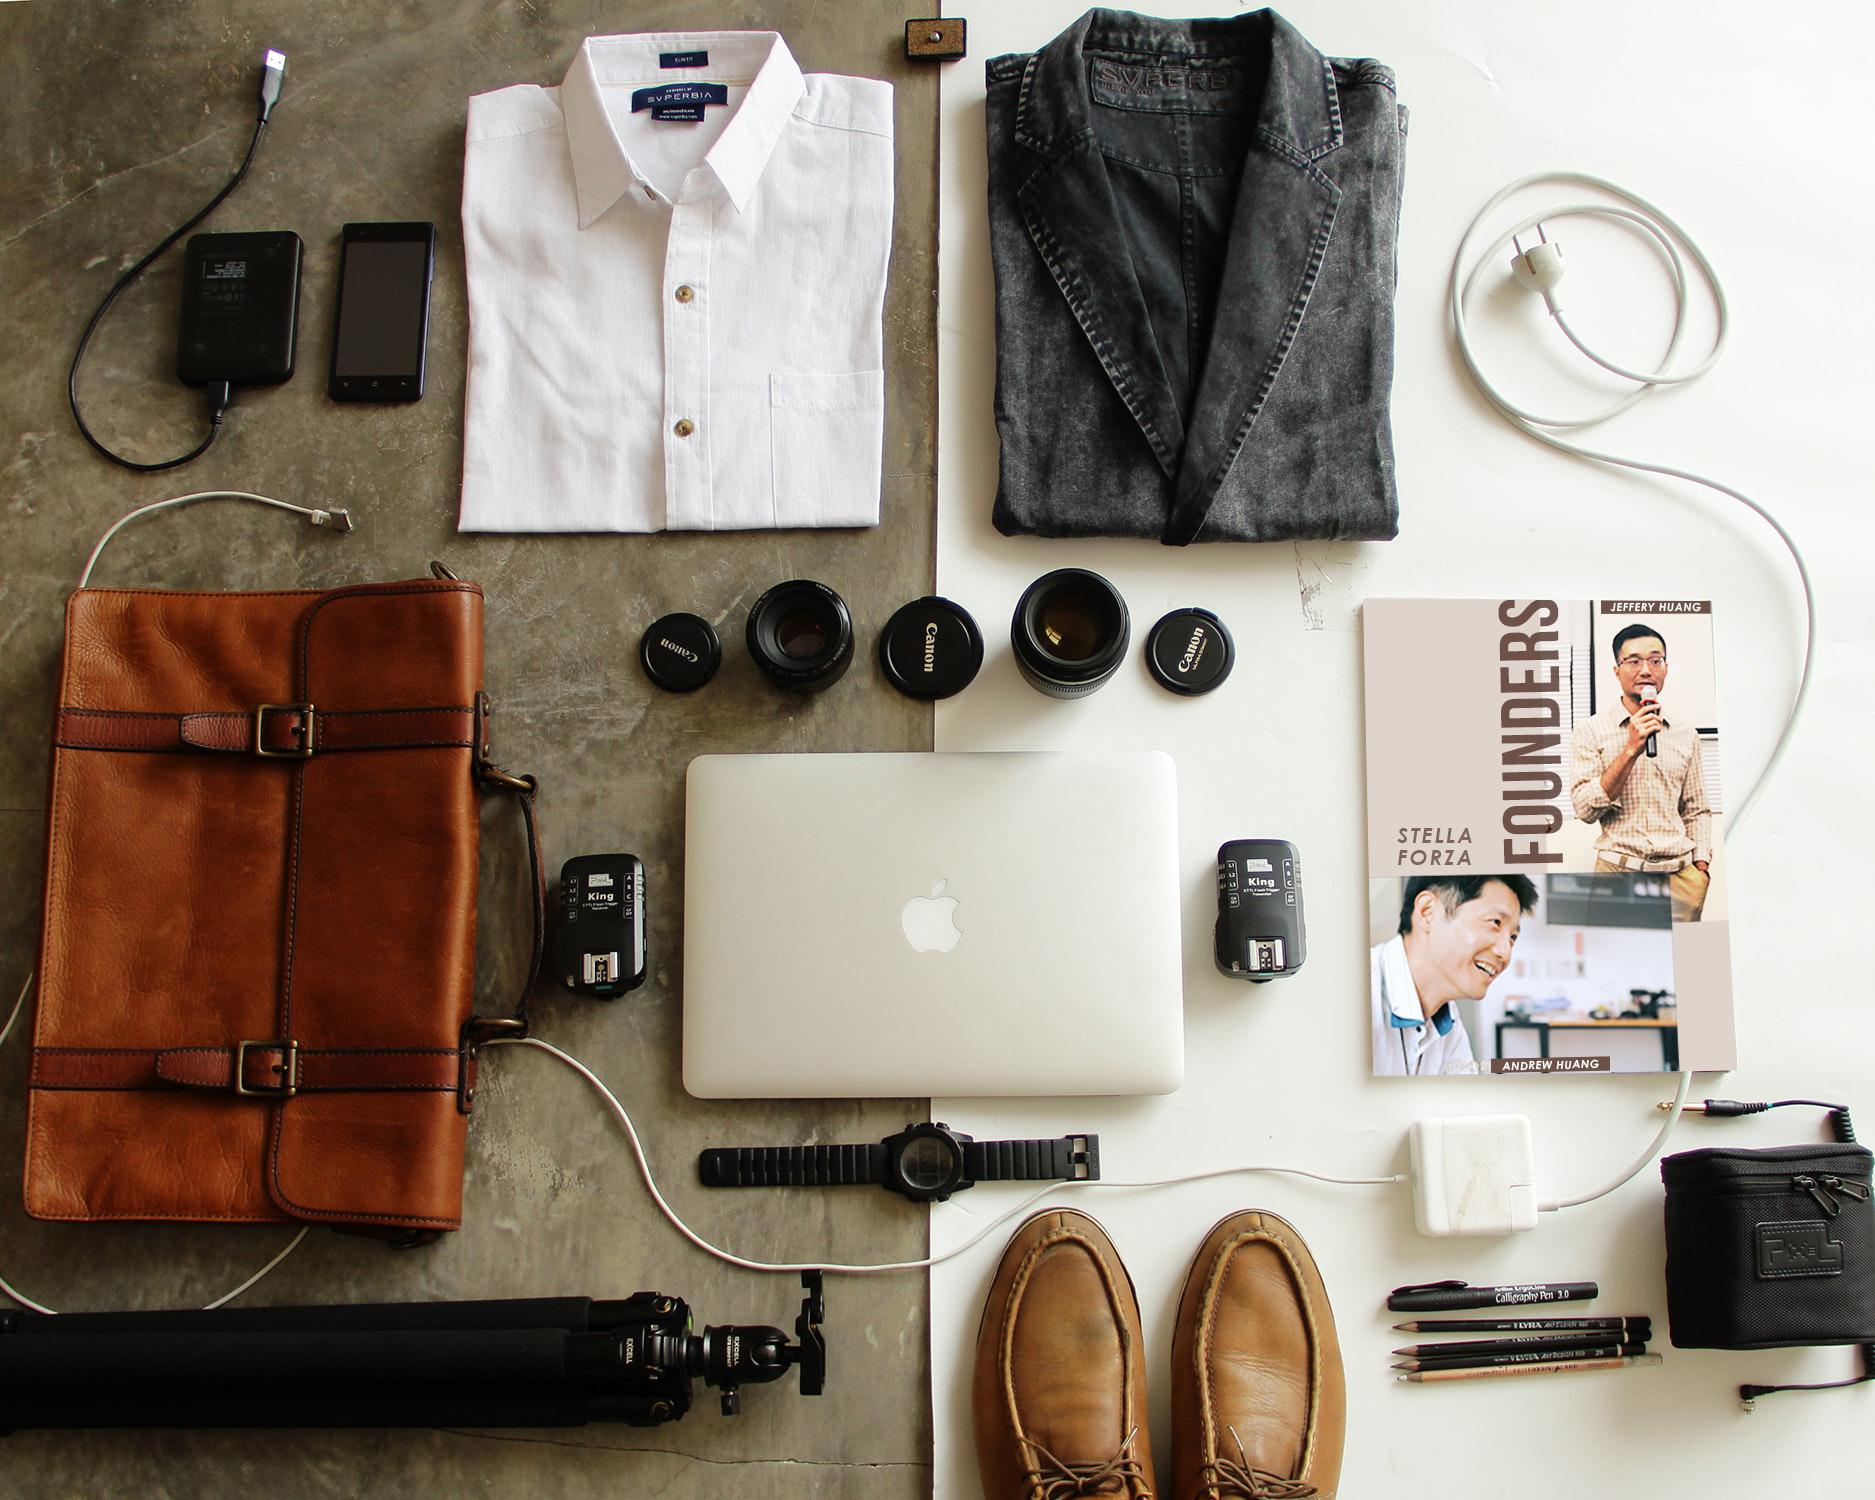 stella-forza,sf,design,leather,craft